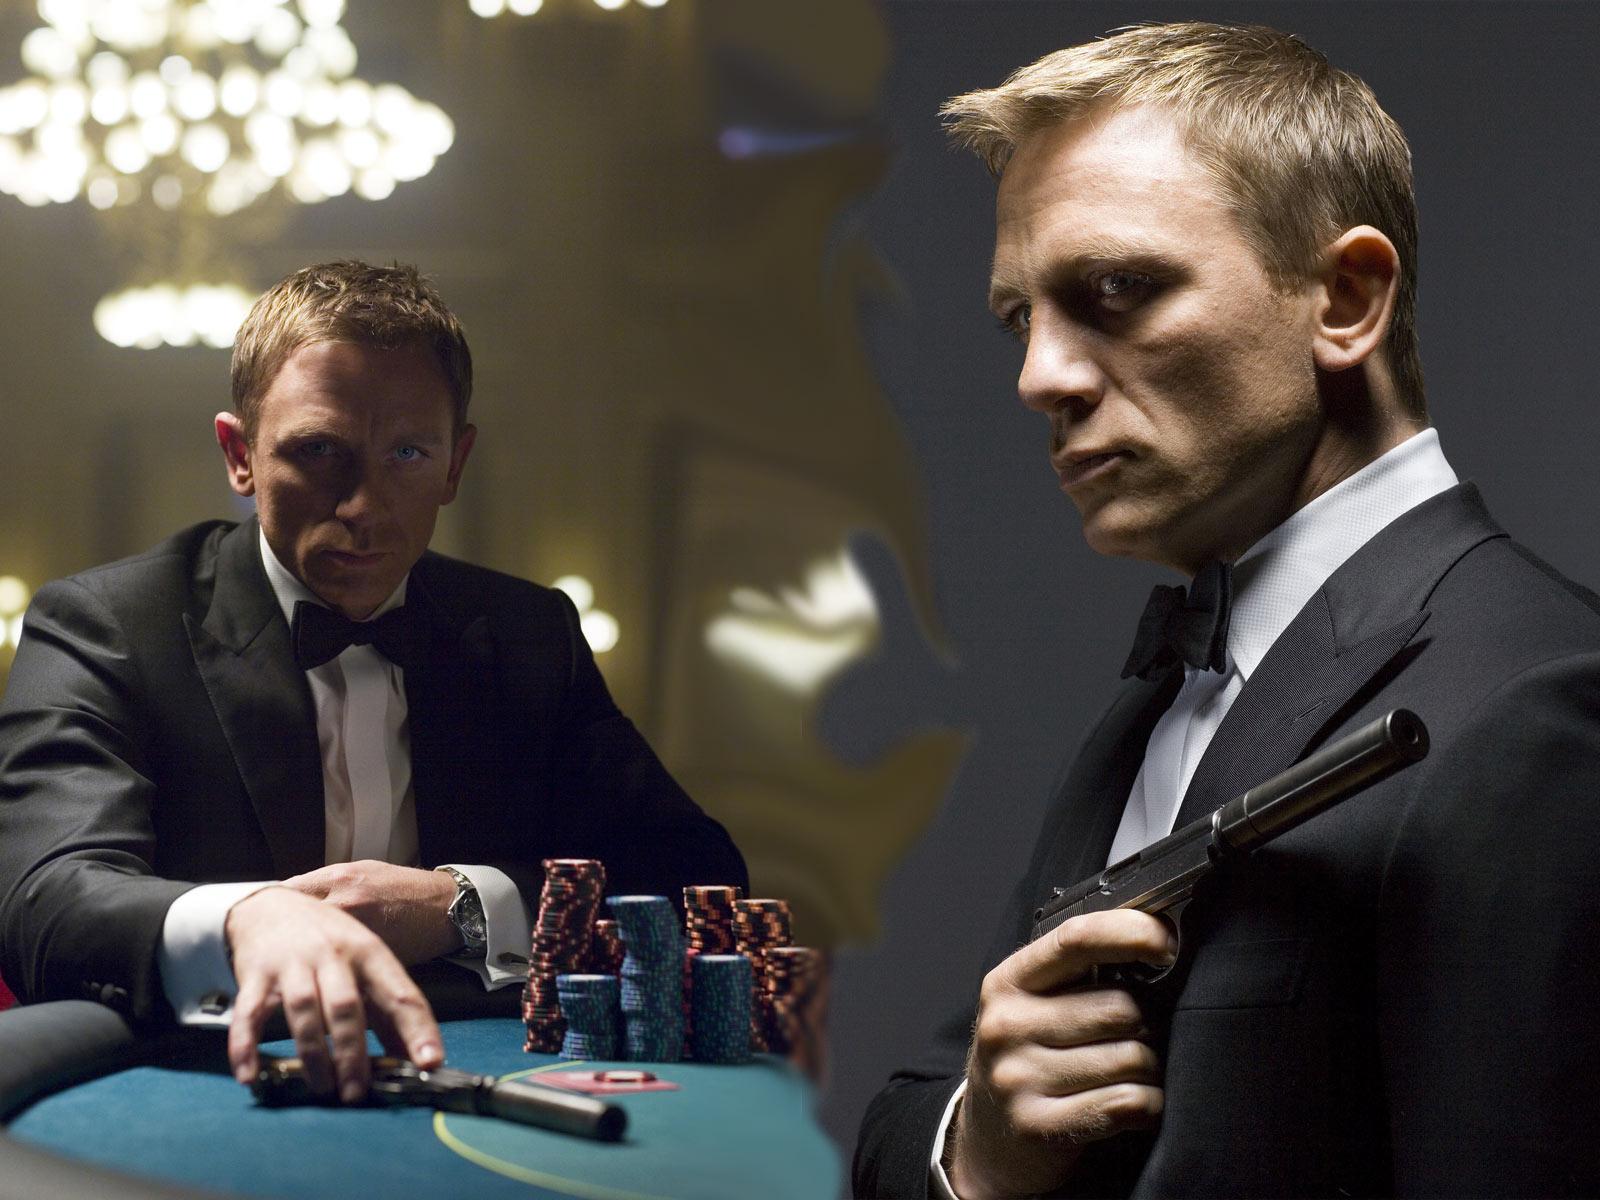 http://4.bp.blogspot.com/-1N_hGVUxVMA/TrMrX-lYK6I/AAAAAAAADyE/ULBBmoEy7sA/s1600/Daniel-Craig-as-James-Bond.jpg